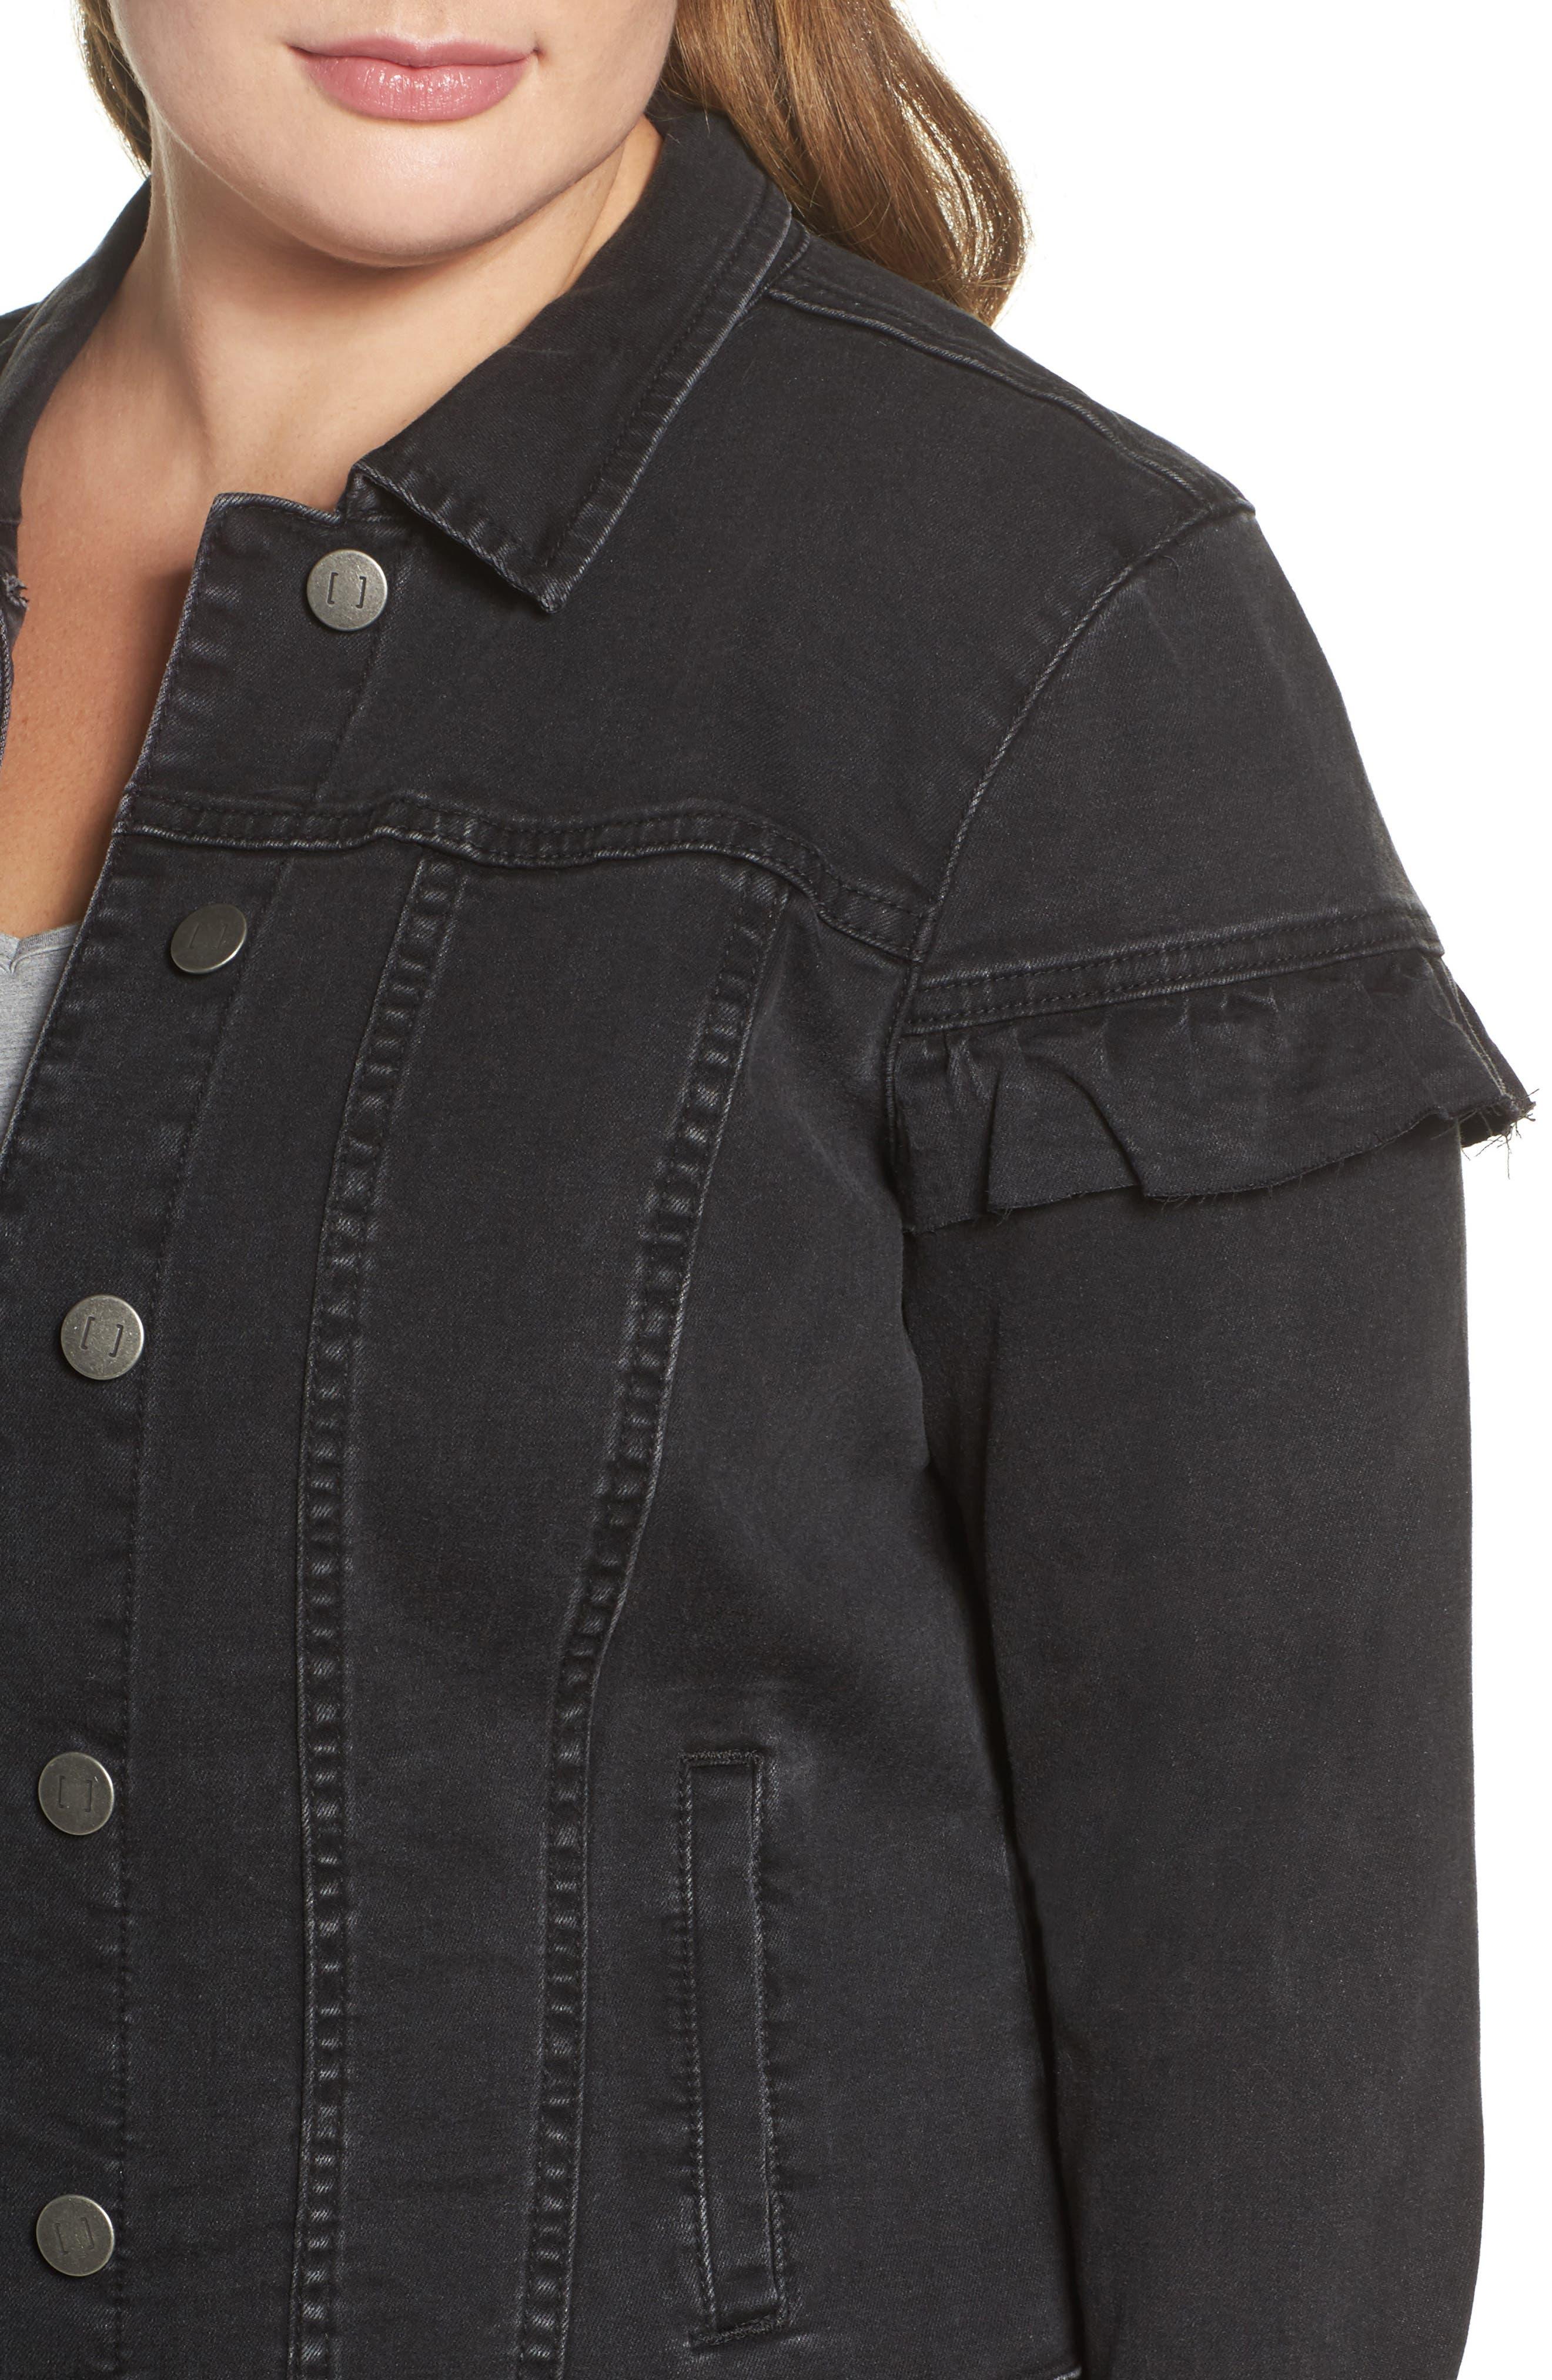 Katinka Denim Jacket,                             Alternate thumbnail 4, color,                             Black